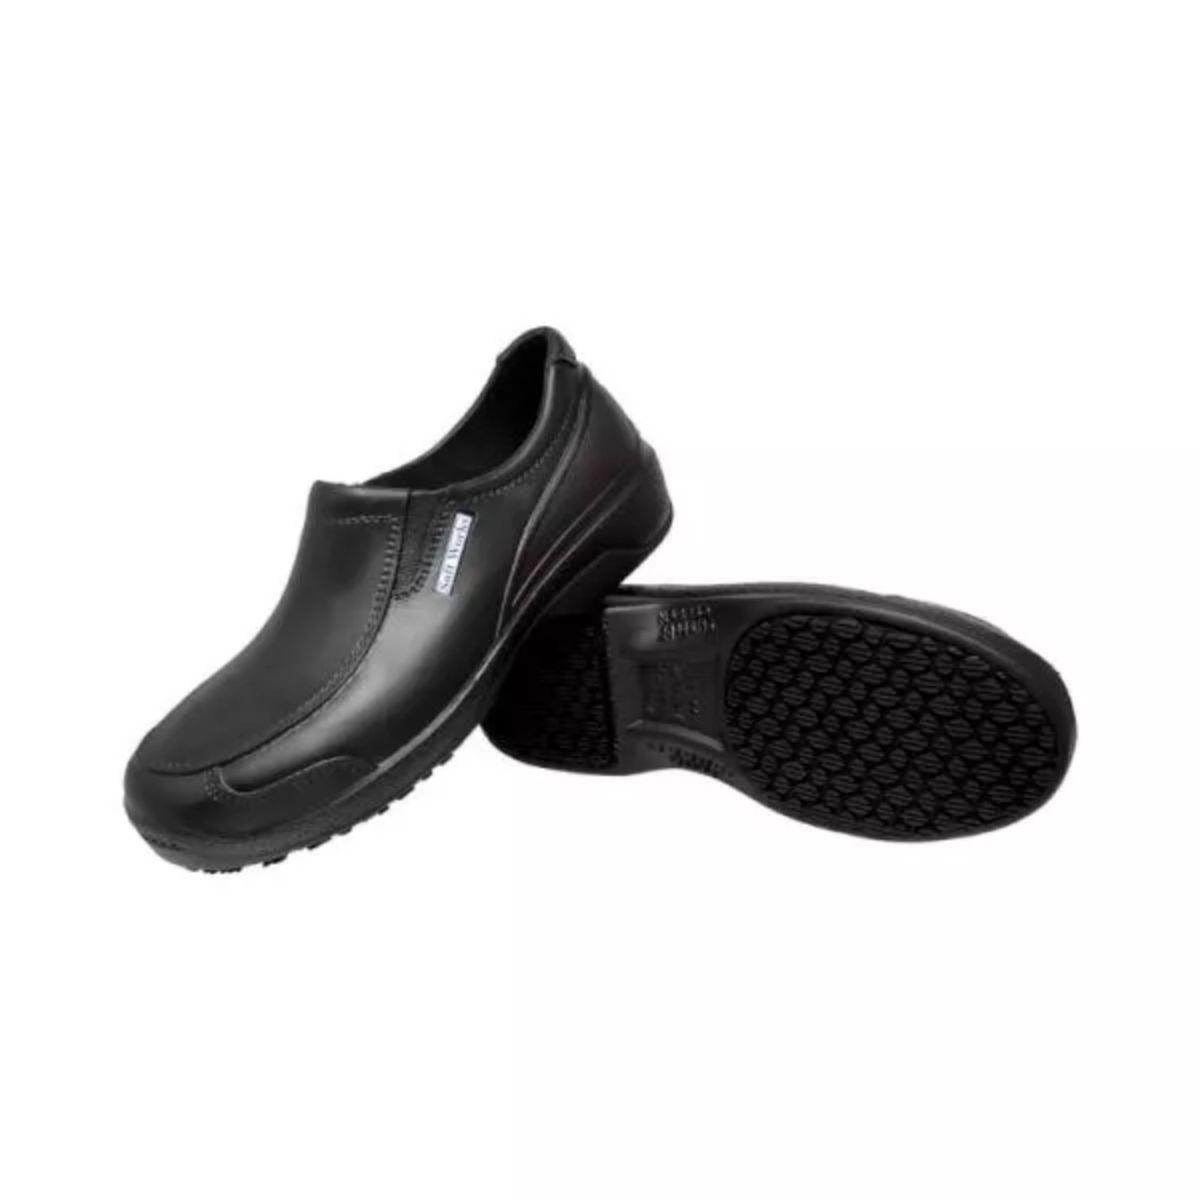 Sapato Babuch Profissional Soft Works Antiderrapante sem Biqueira